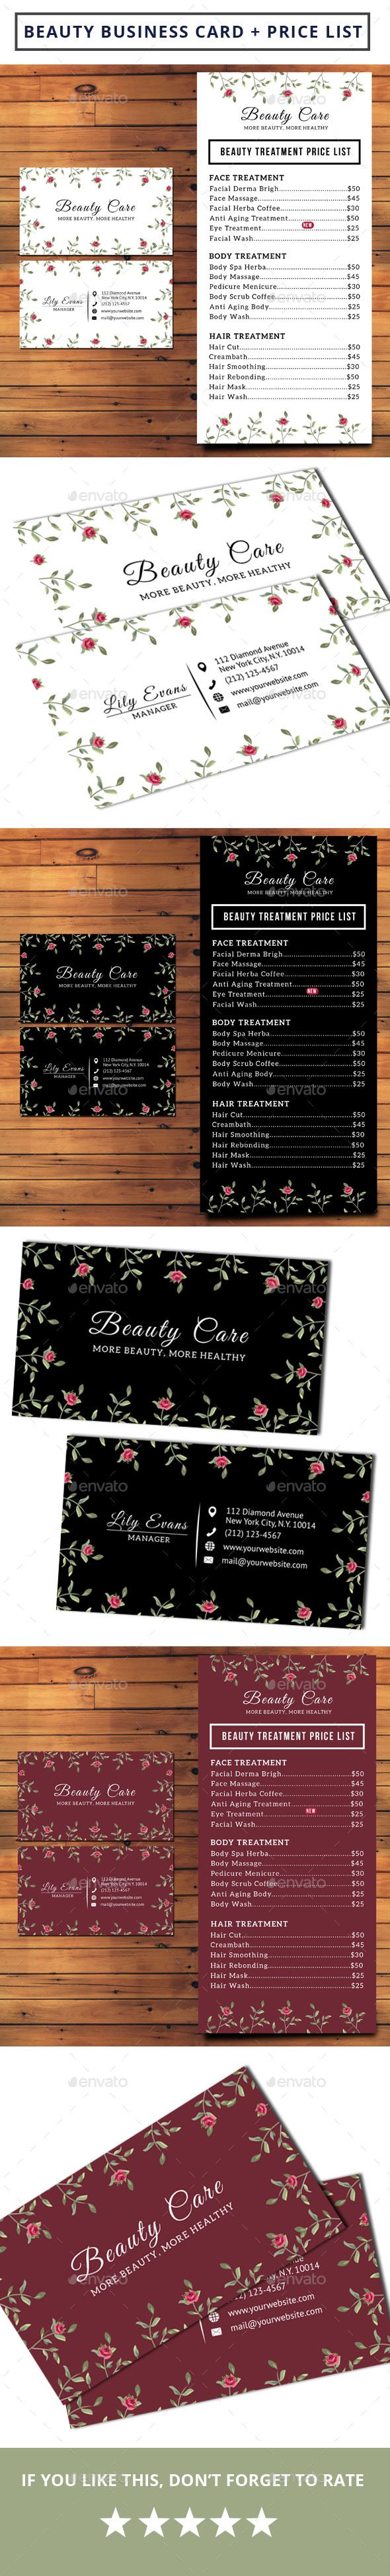 beauty business card pricelist